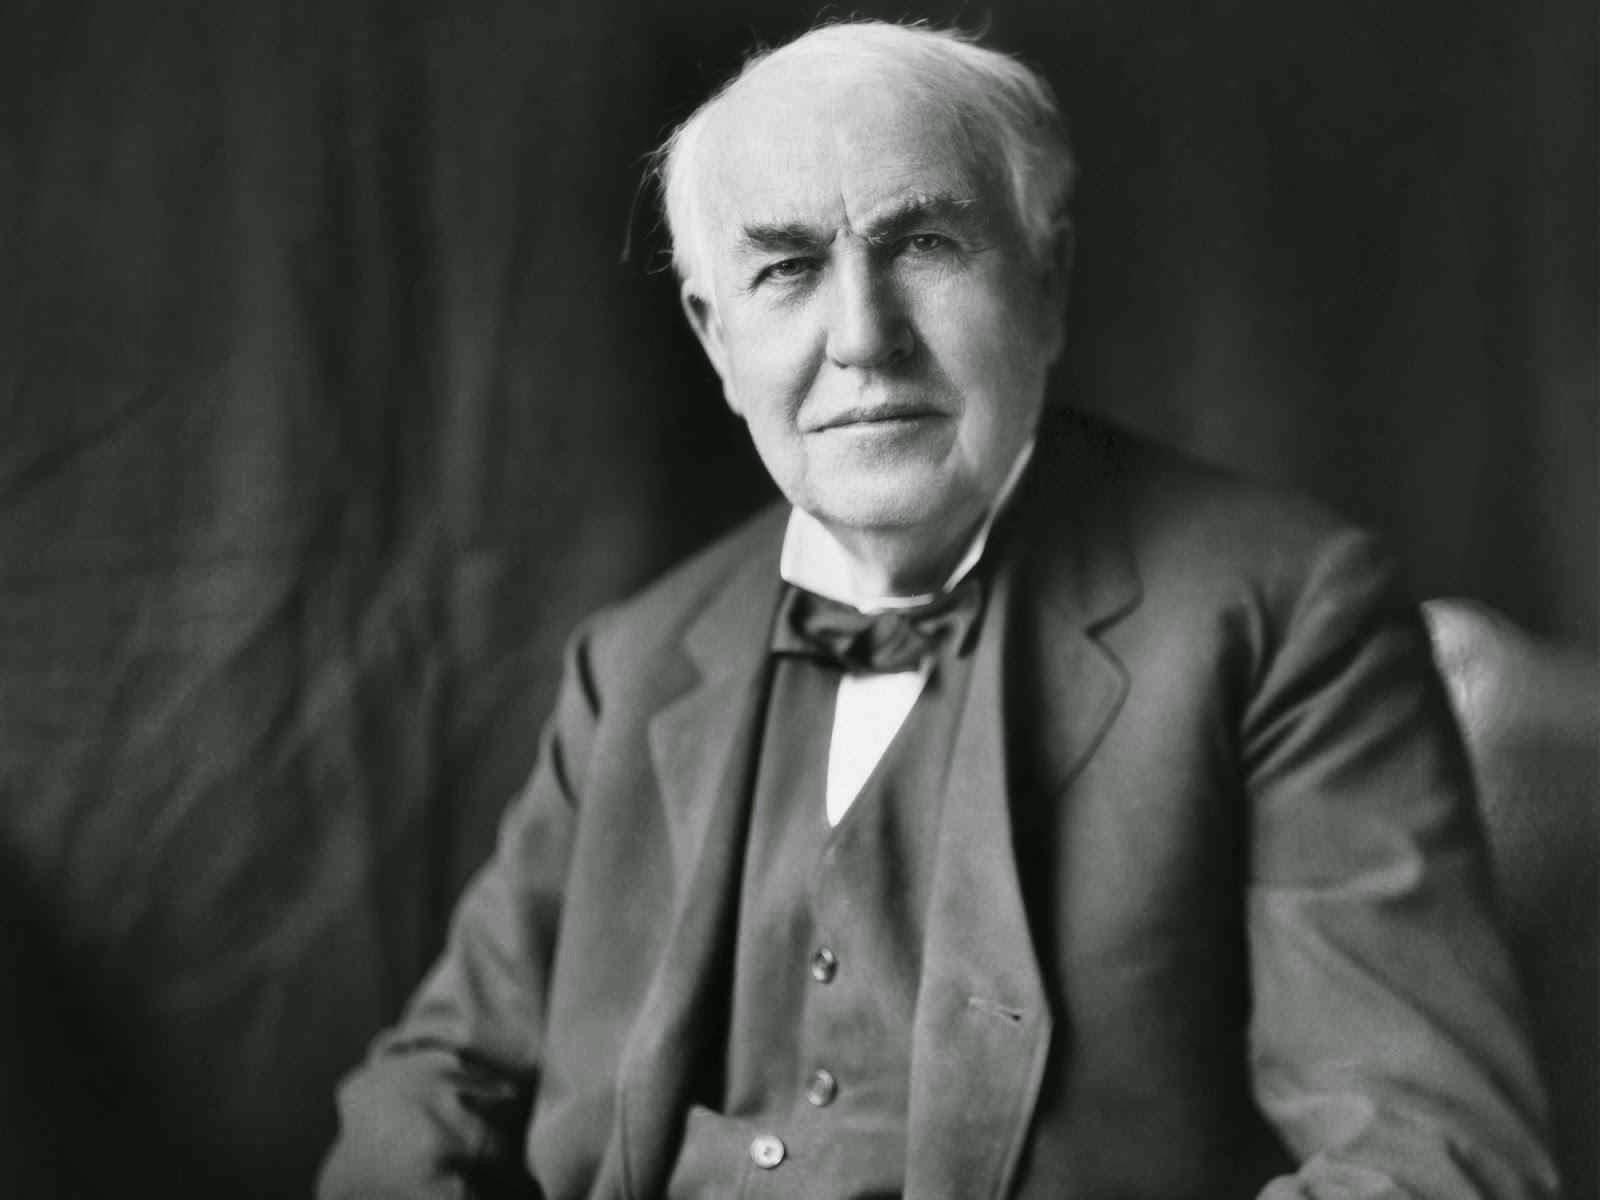 Scientist Thomas Edison Photo